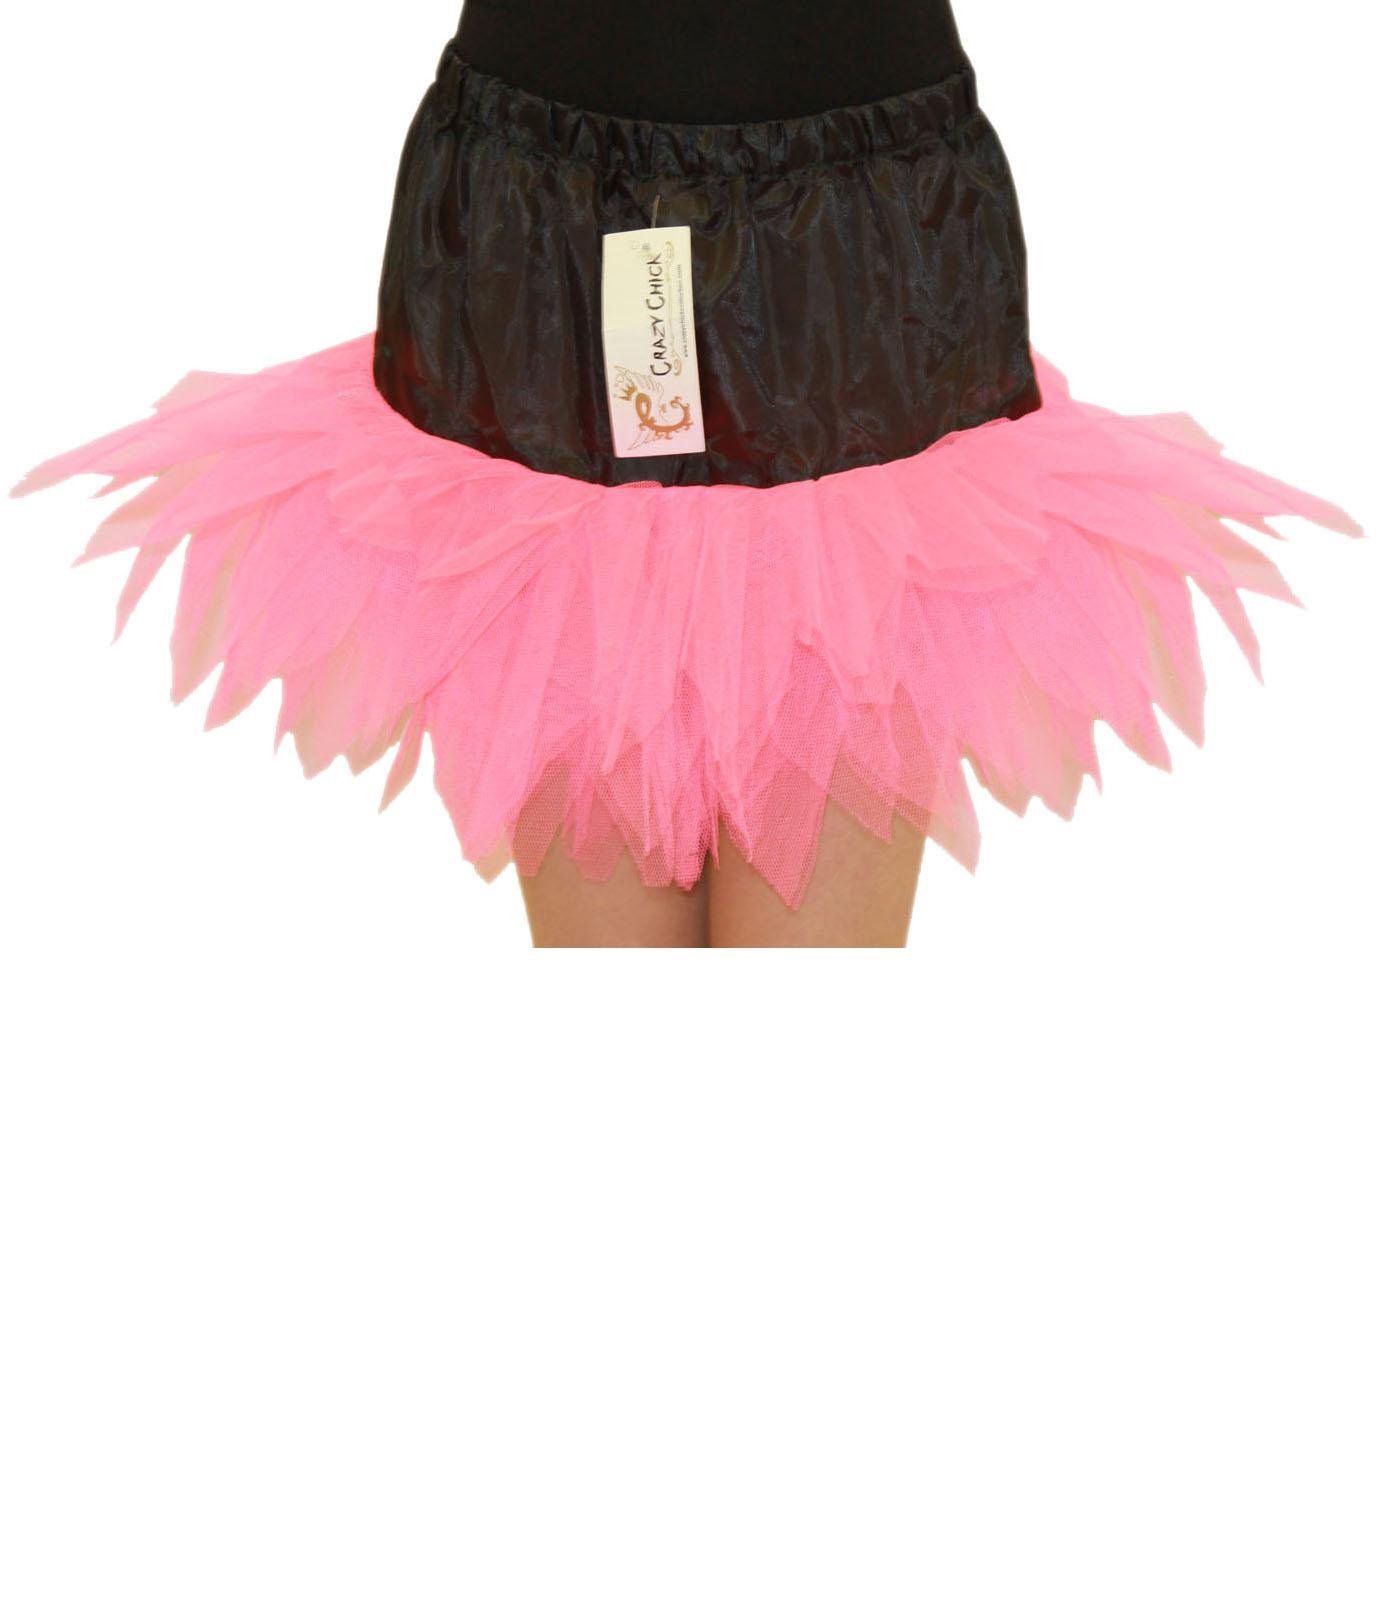 Crazy Chick Girls 6 Layers Petal Pink Black TuTu Skirt (12 Inches Long)